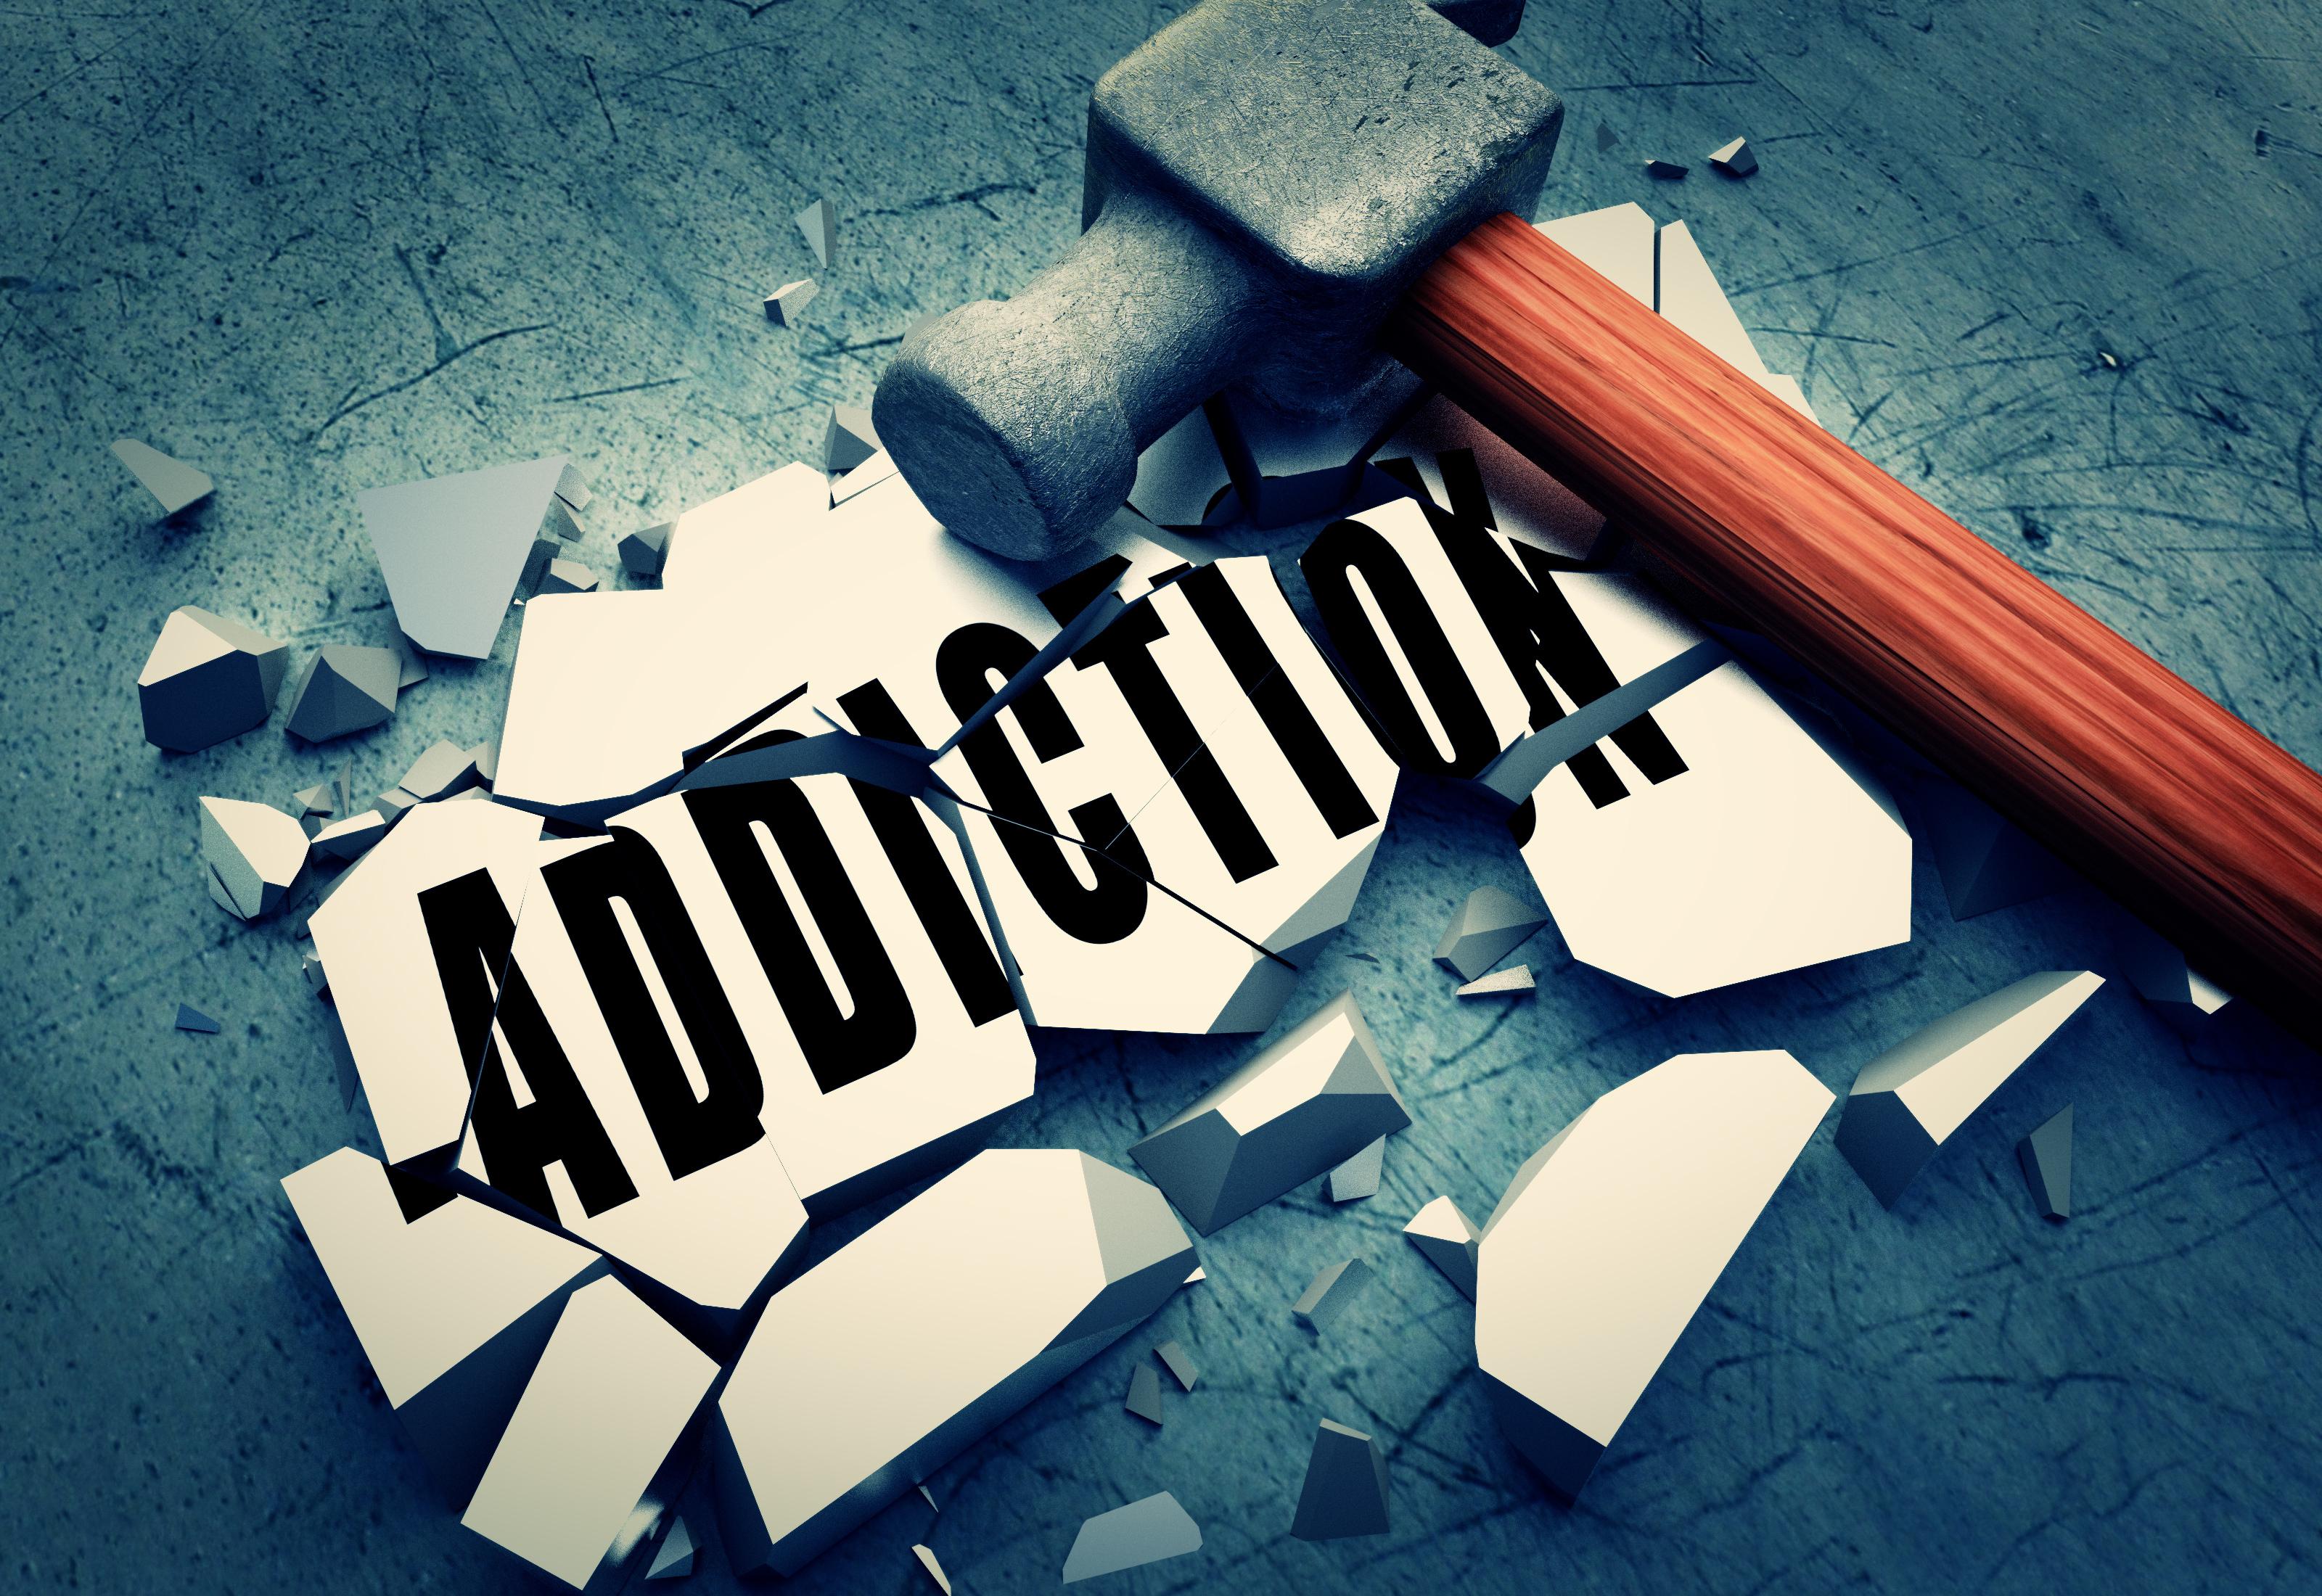 7 Addiction Insolite